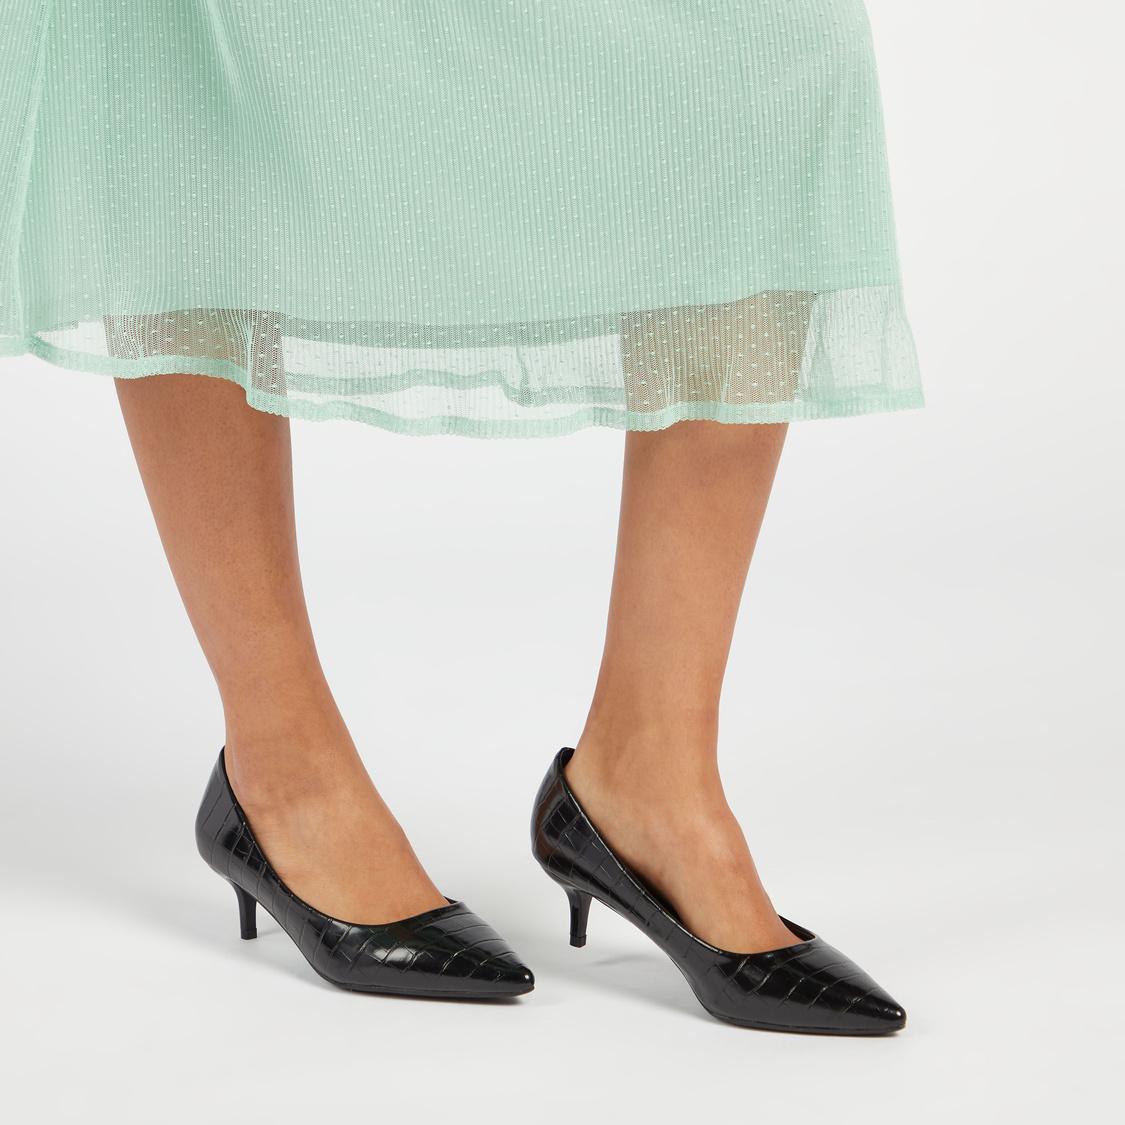 Textured Slip-On Pumps with Kitten Heels